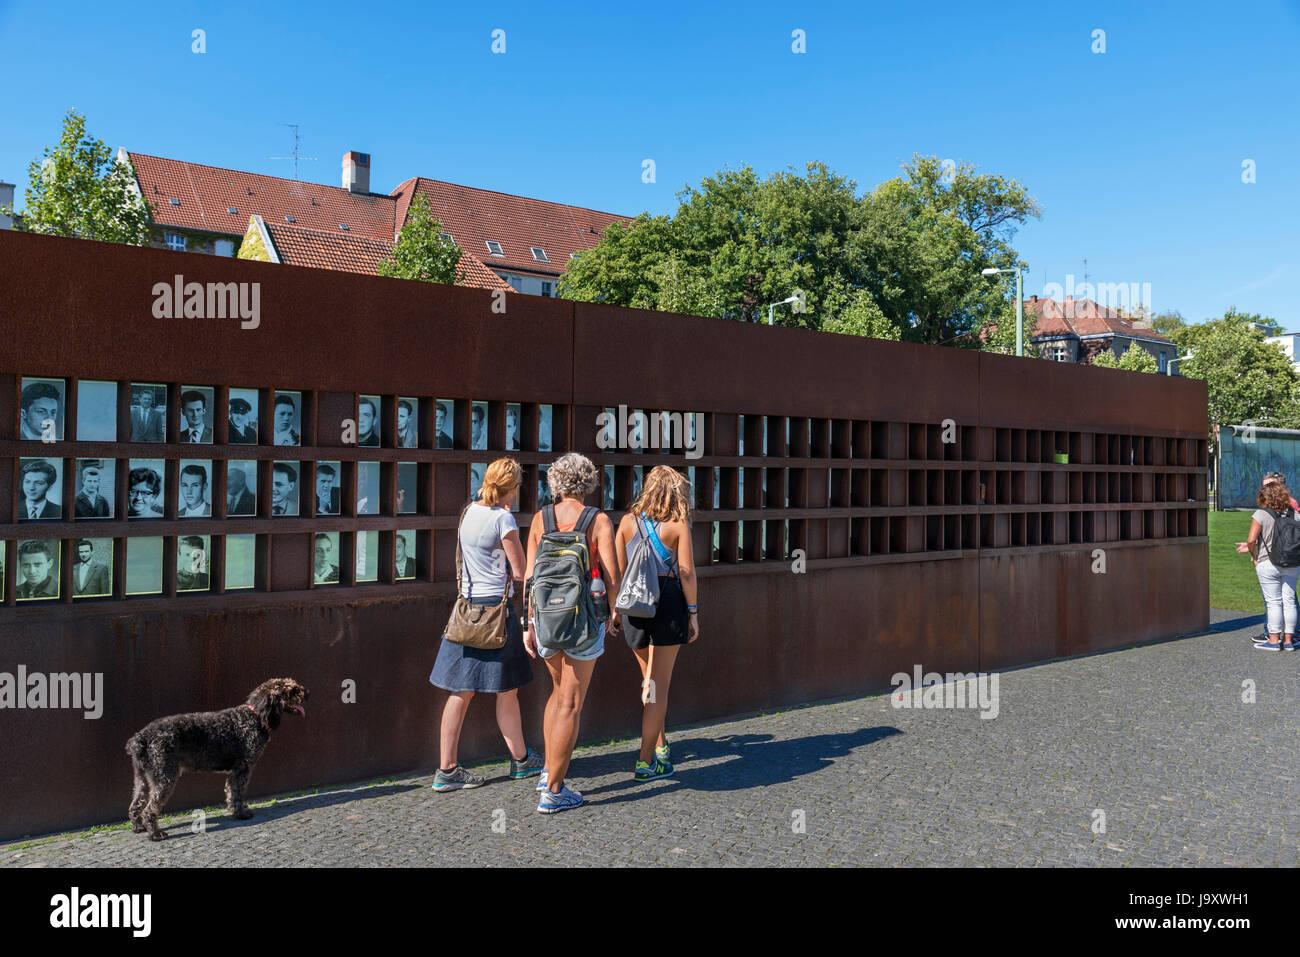 The Gedenkstätte Berliner Mauer (Berlin Wall Memorial), Bernauer Strasse, Berlin, Germany - Stock Image